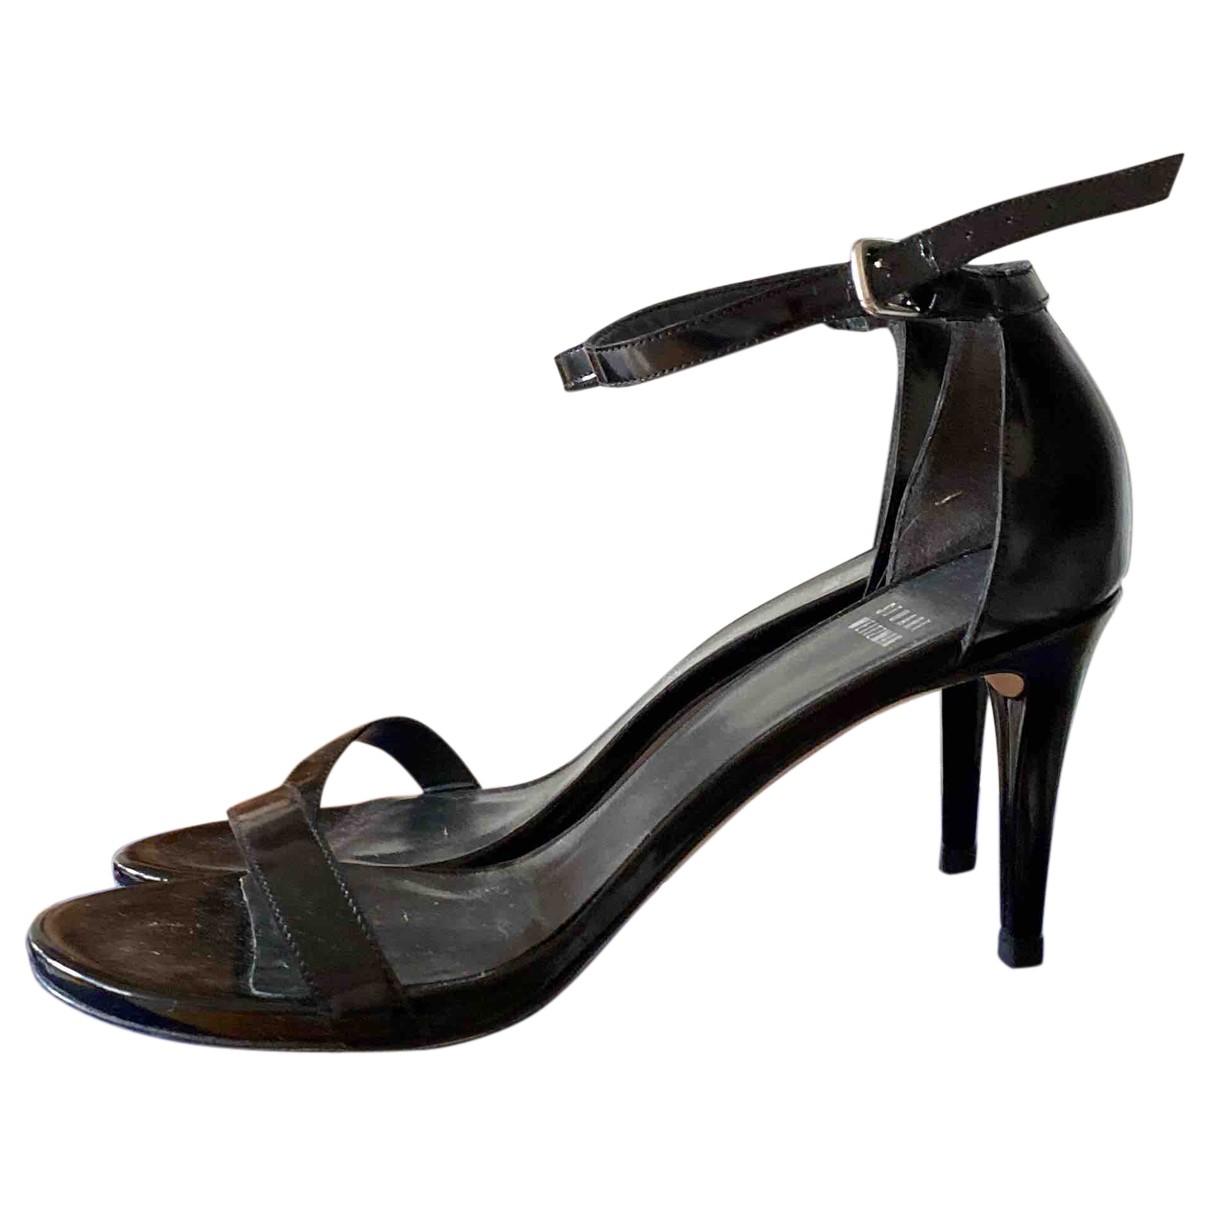 Stuart Weitzman N Black Patent leather Sandals for Women 38 EU